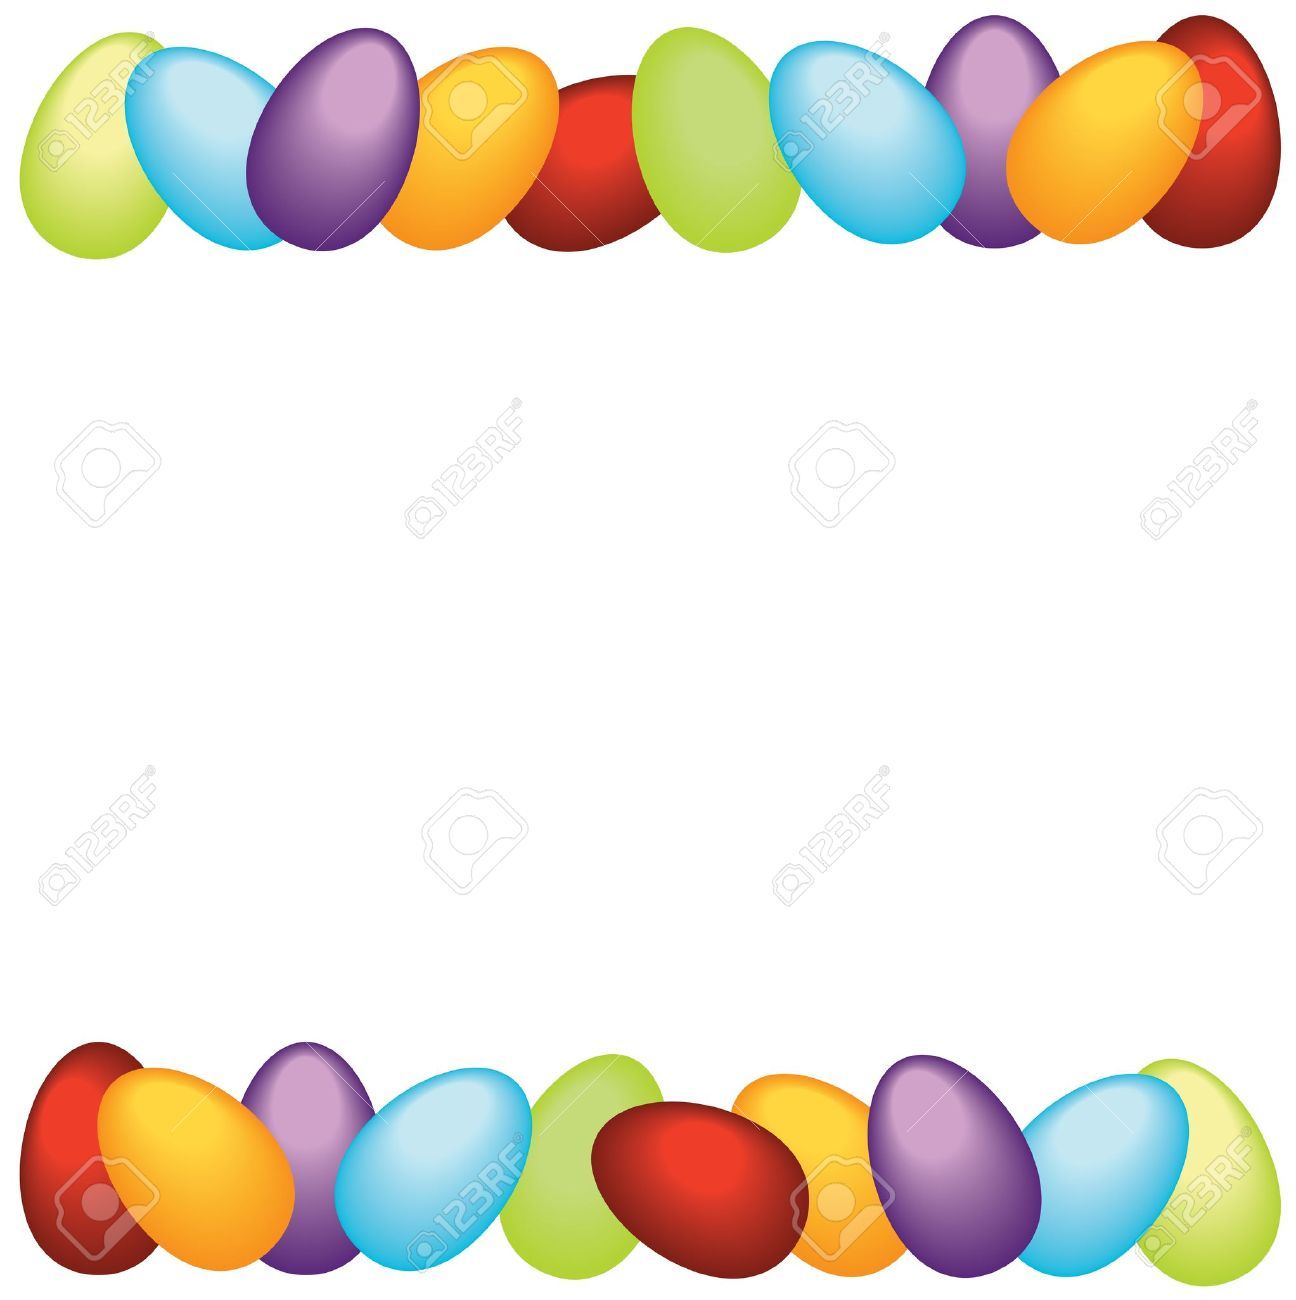 Easter clipart free borders svg download Easter Border Clipart Free | Free download best Easter Border ... svg download